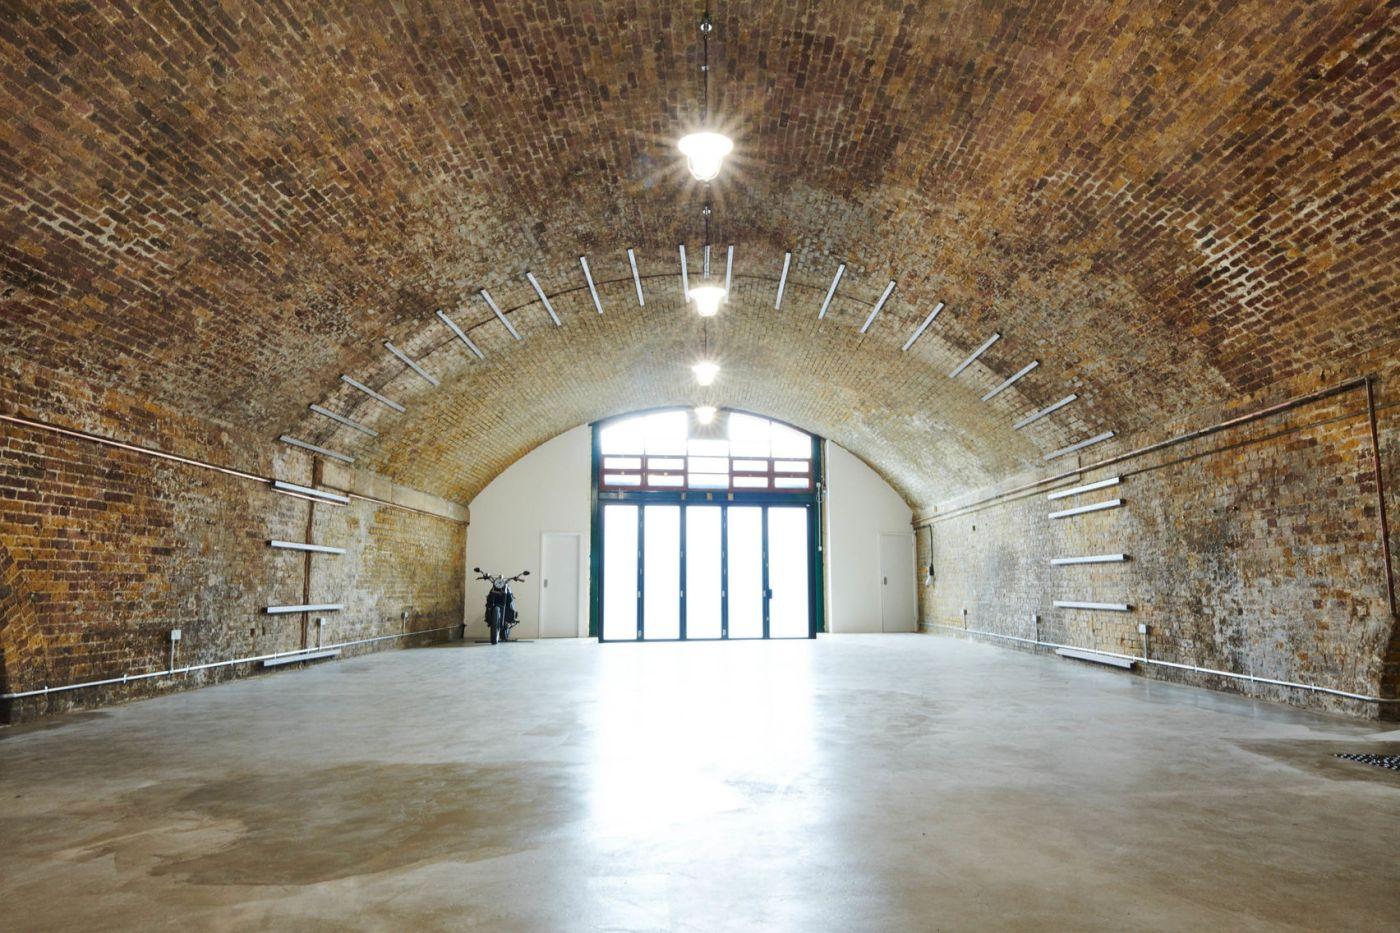 A large urban archway venue